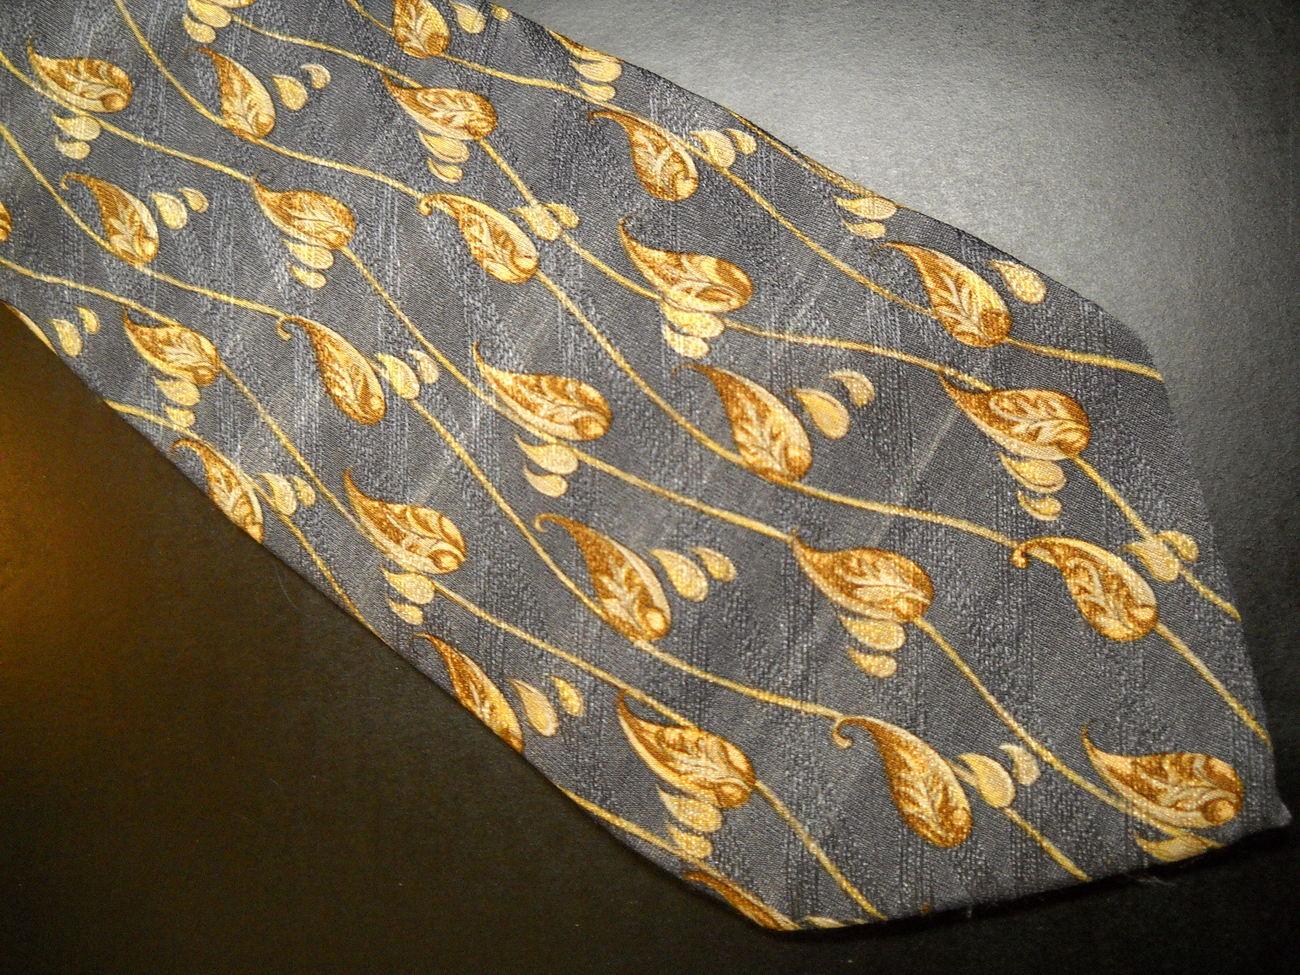 Joseph Abboud Neck Tie Design No 71212 Greys Italian Leaves Vines Golden Browns